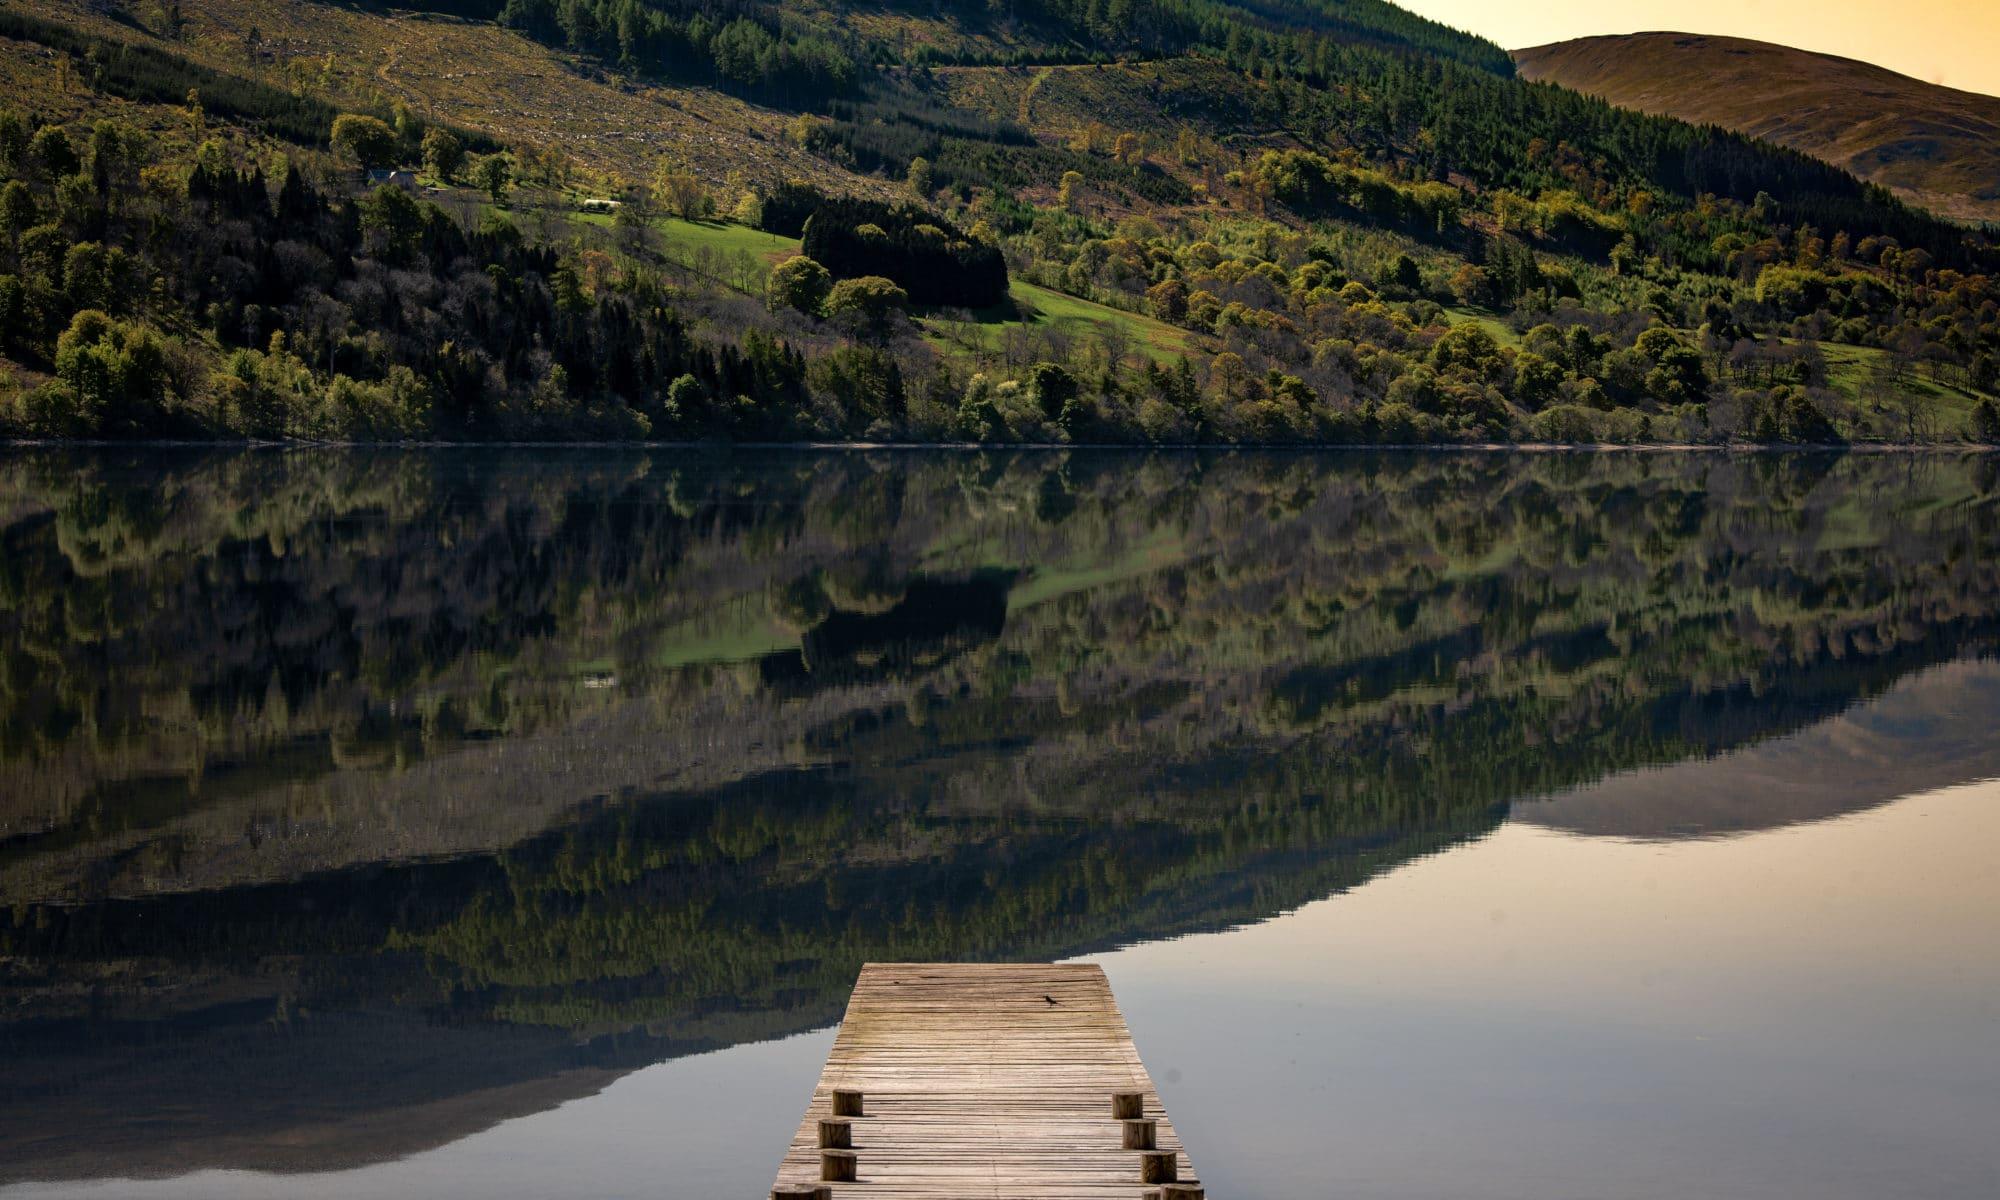 Loch Tay, un vrai miroir